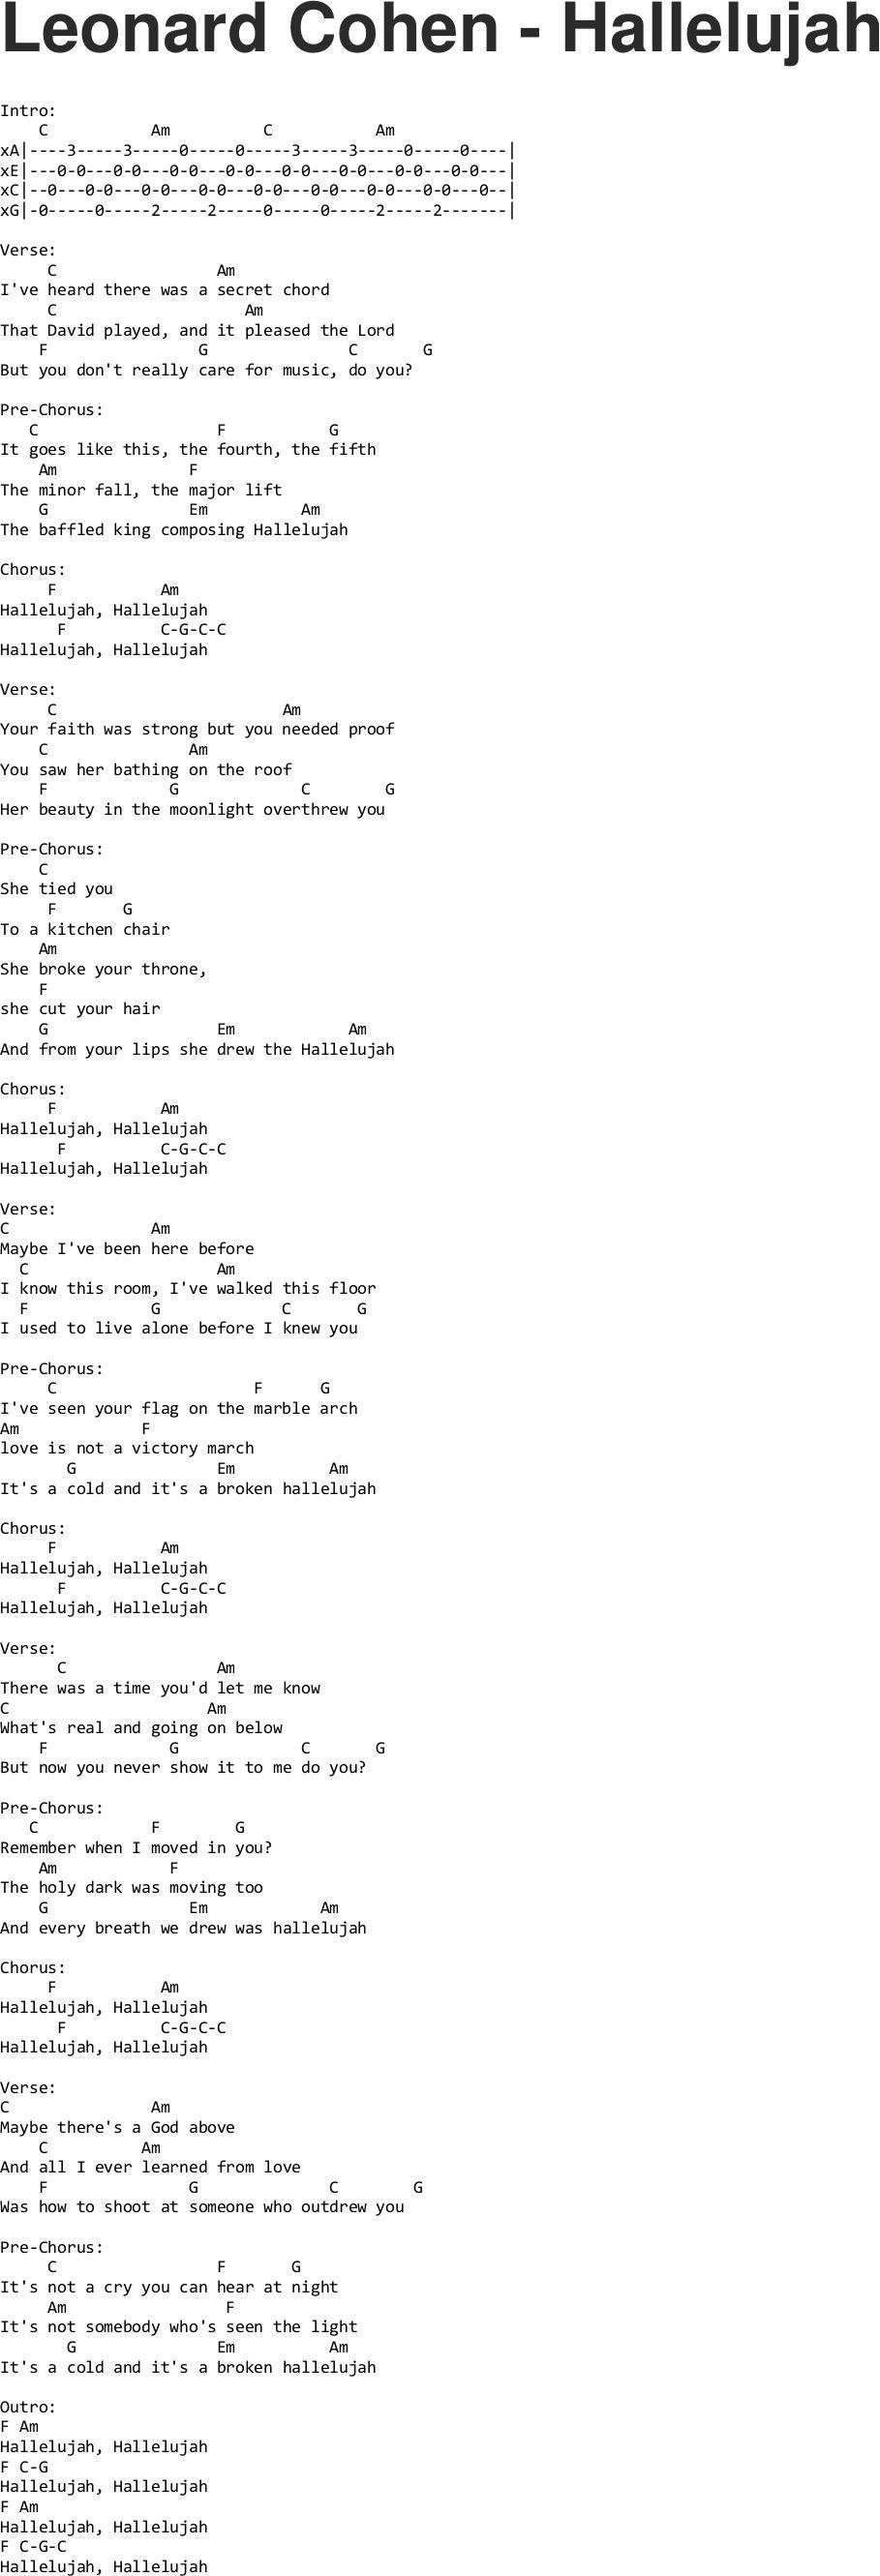 Enchanting Buckley Hallelujah Chords Component - Beginner Guitar ...